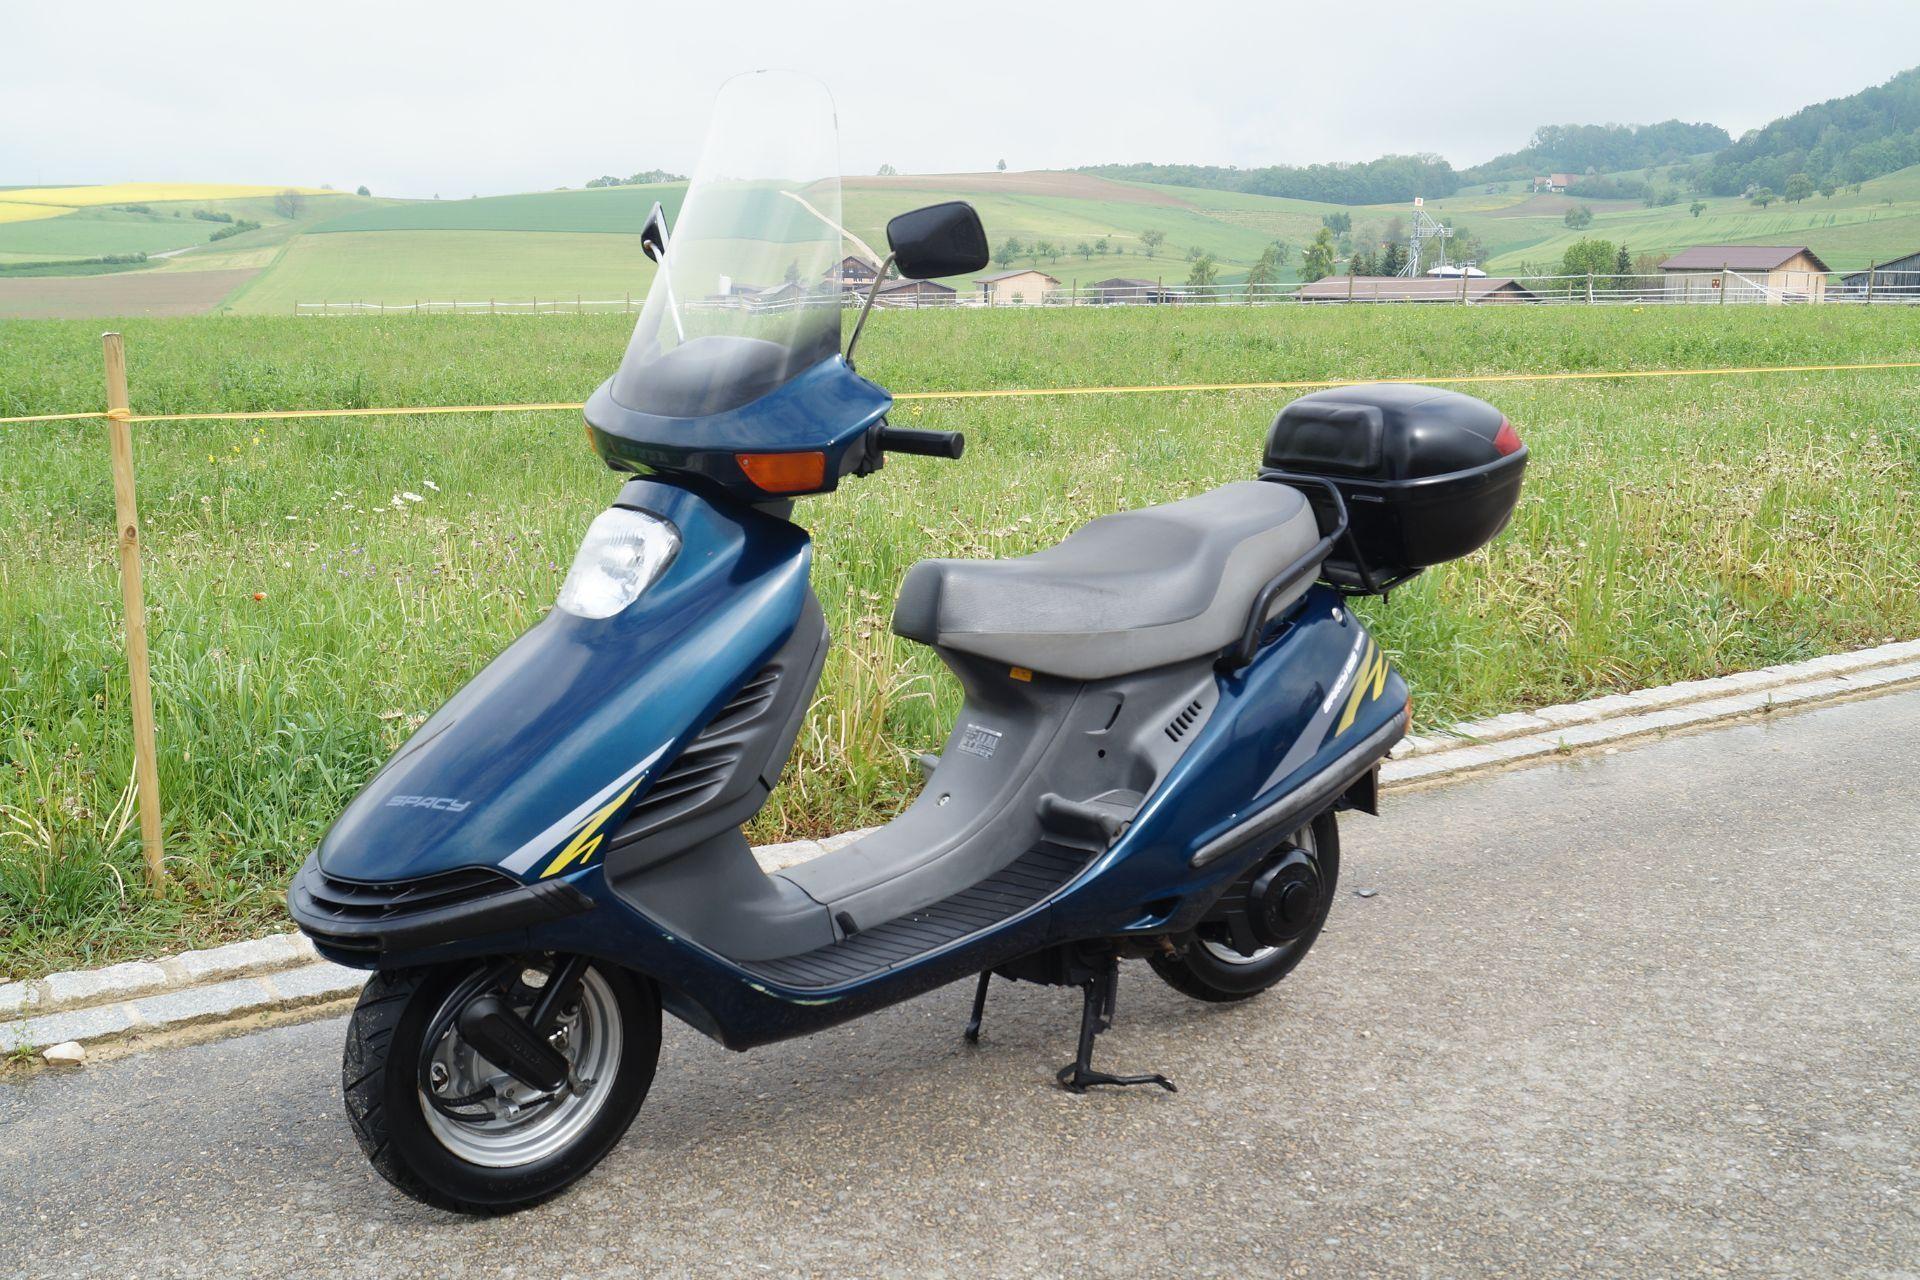 motorrad occasion kaufen honda ch 125 spacy motoshop. Black Bedroom Furniture Sets. Home Design Ideas